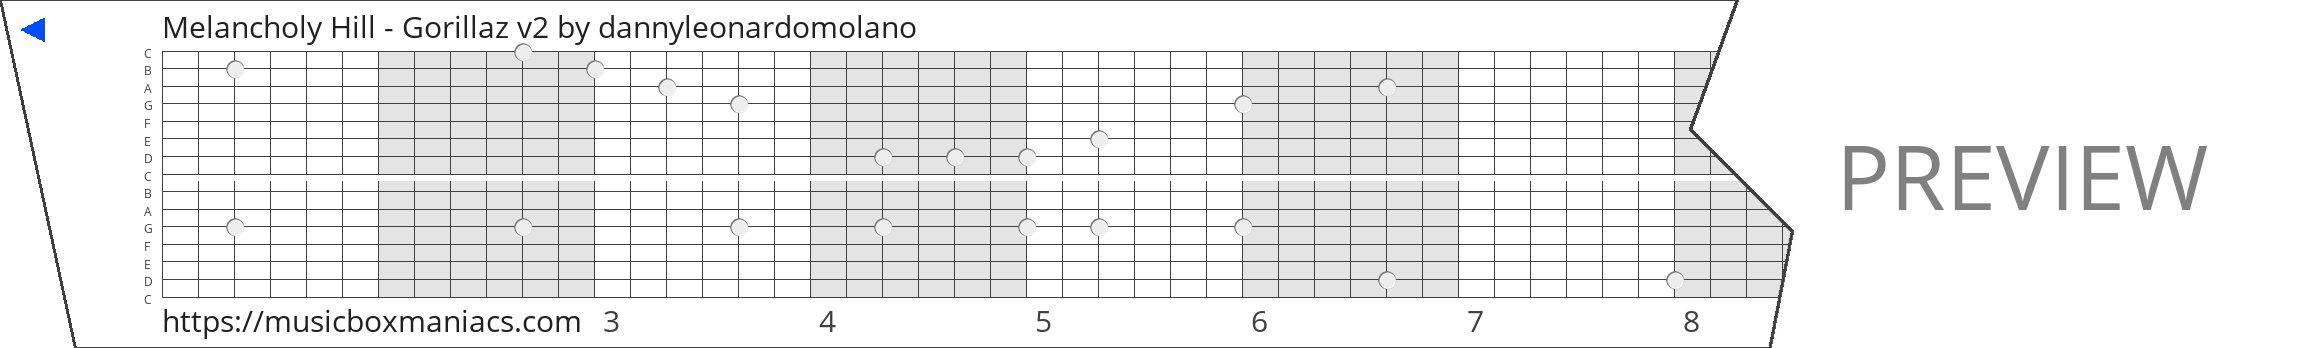 Melancholy Hill - Gorillaz v2 15 note music box paper strip